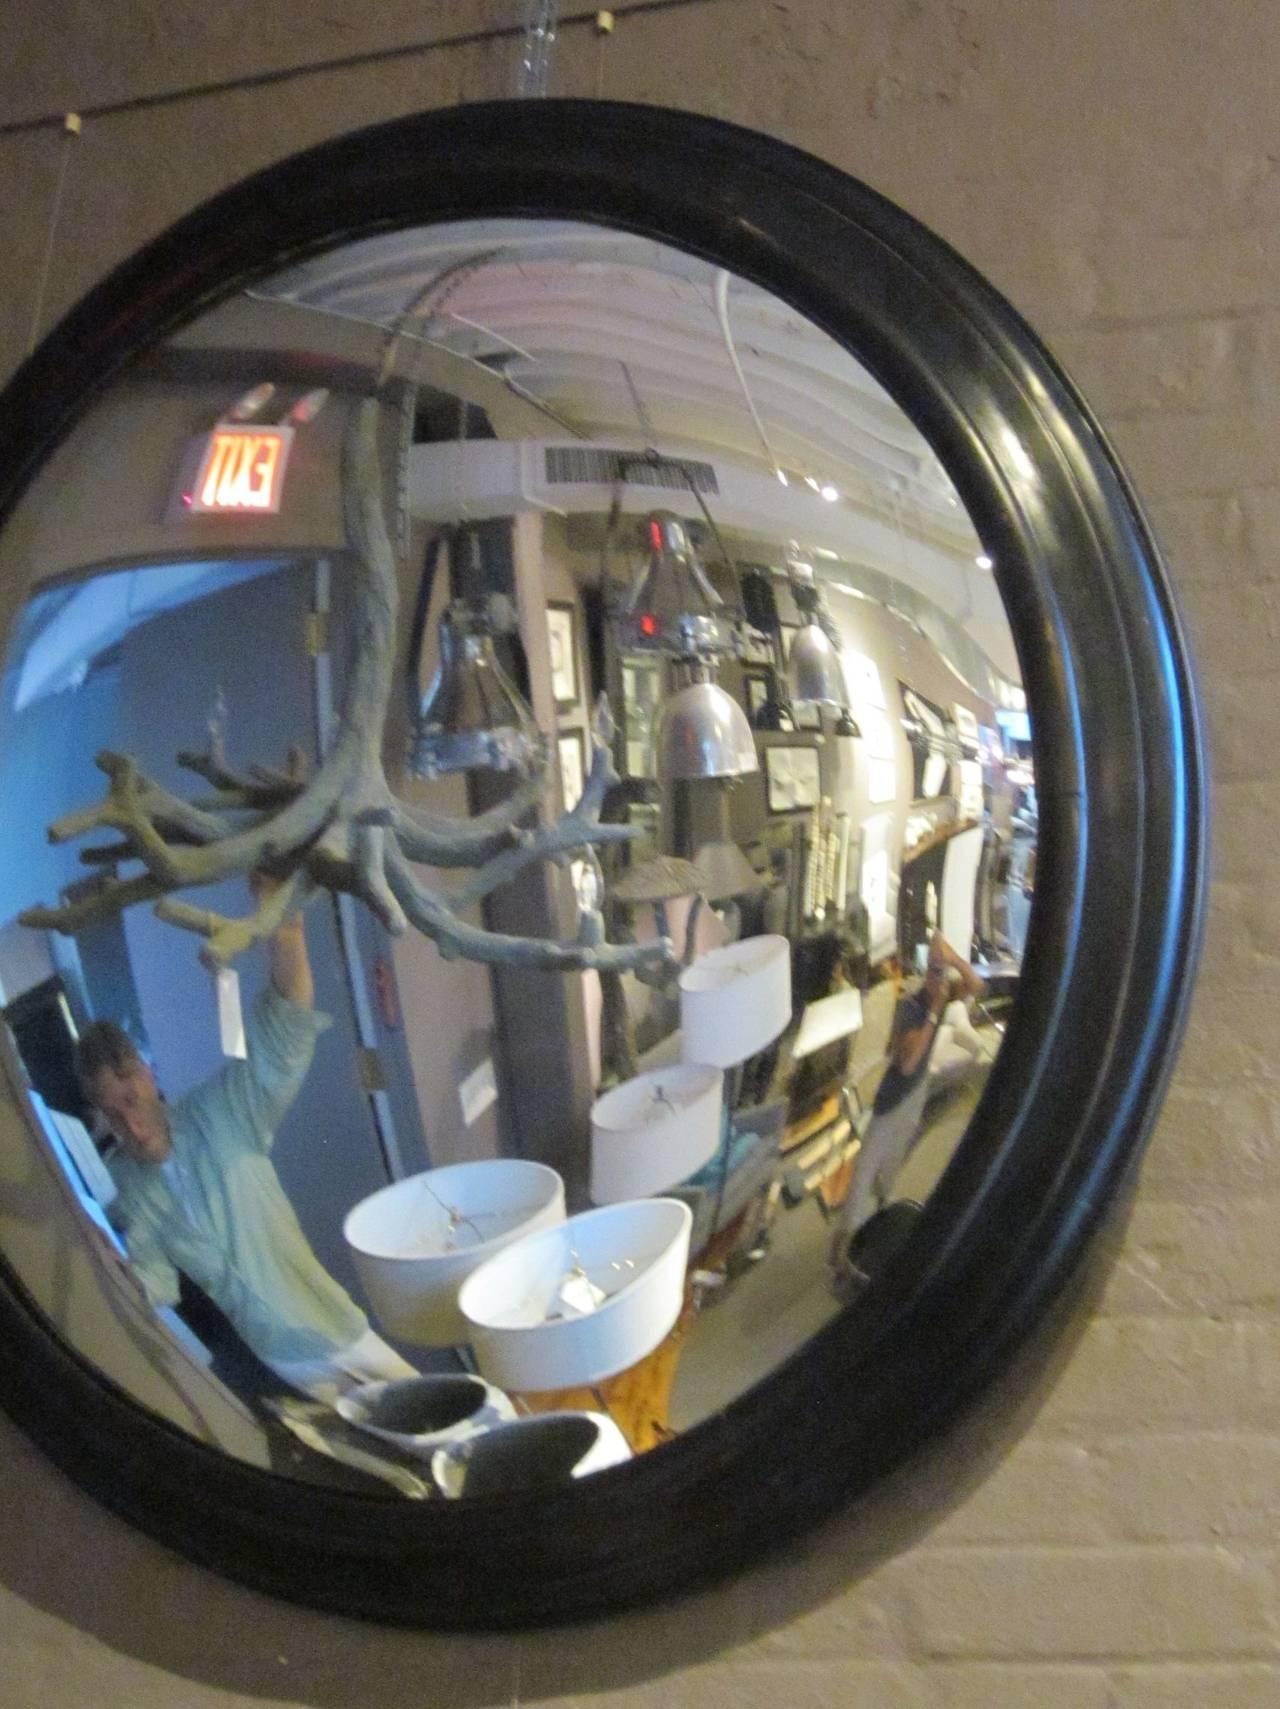 French Napoleon Iii Extra Large Round Convex Mirror In Black Frame Regarding Round Convex Mirrors (Image 5 of 15)